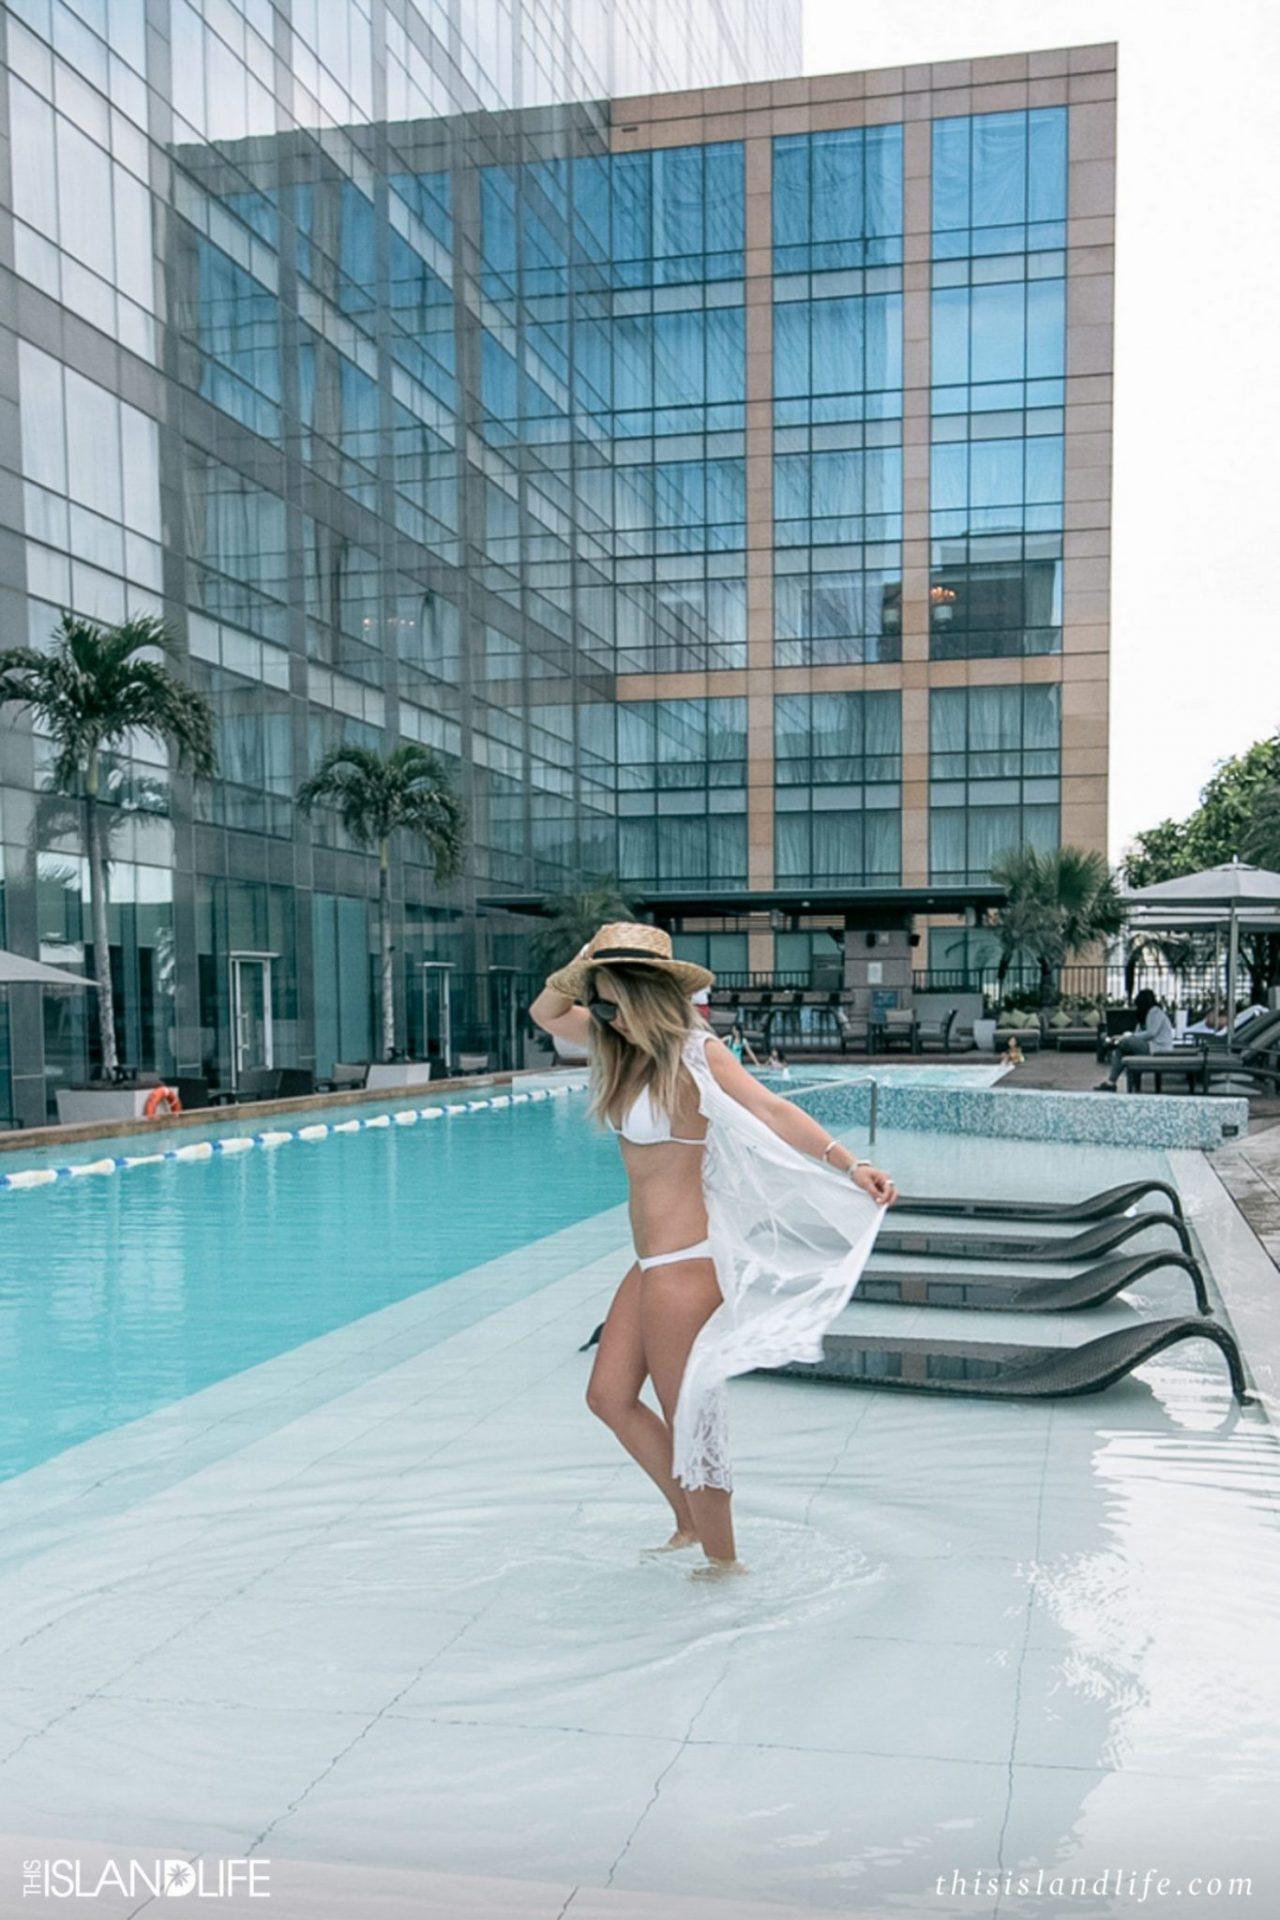 This Island Life | Fairmont Makati, Manila, Philippines